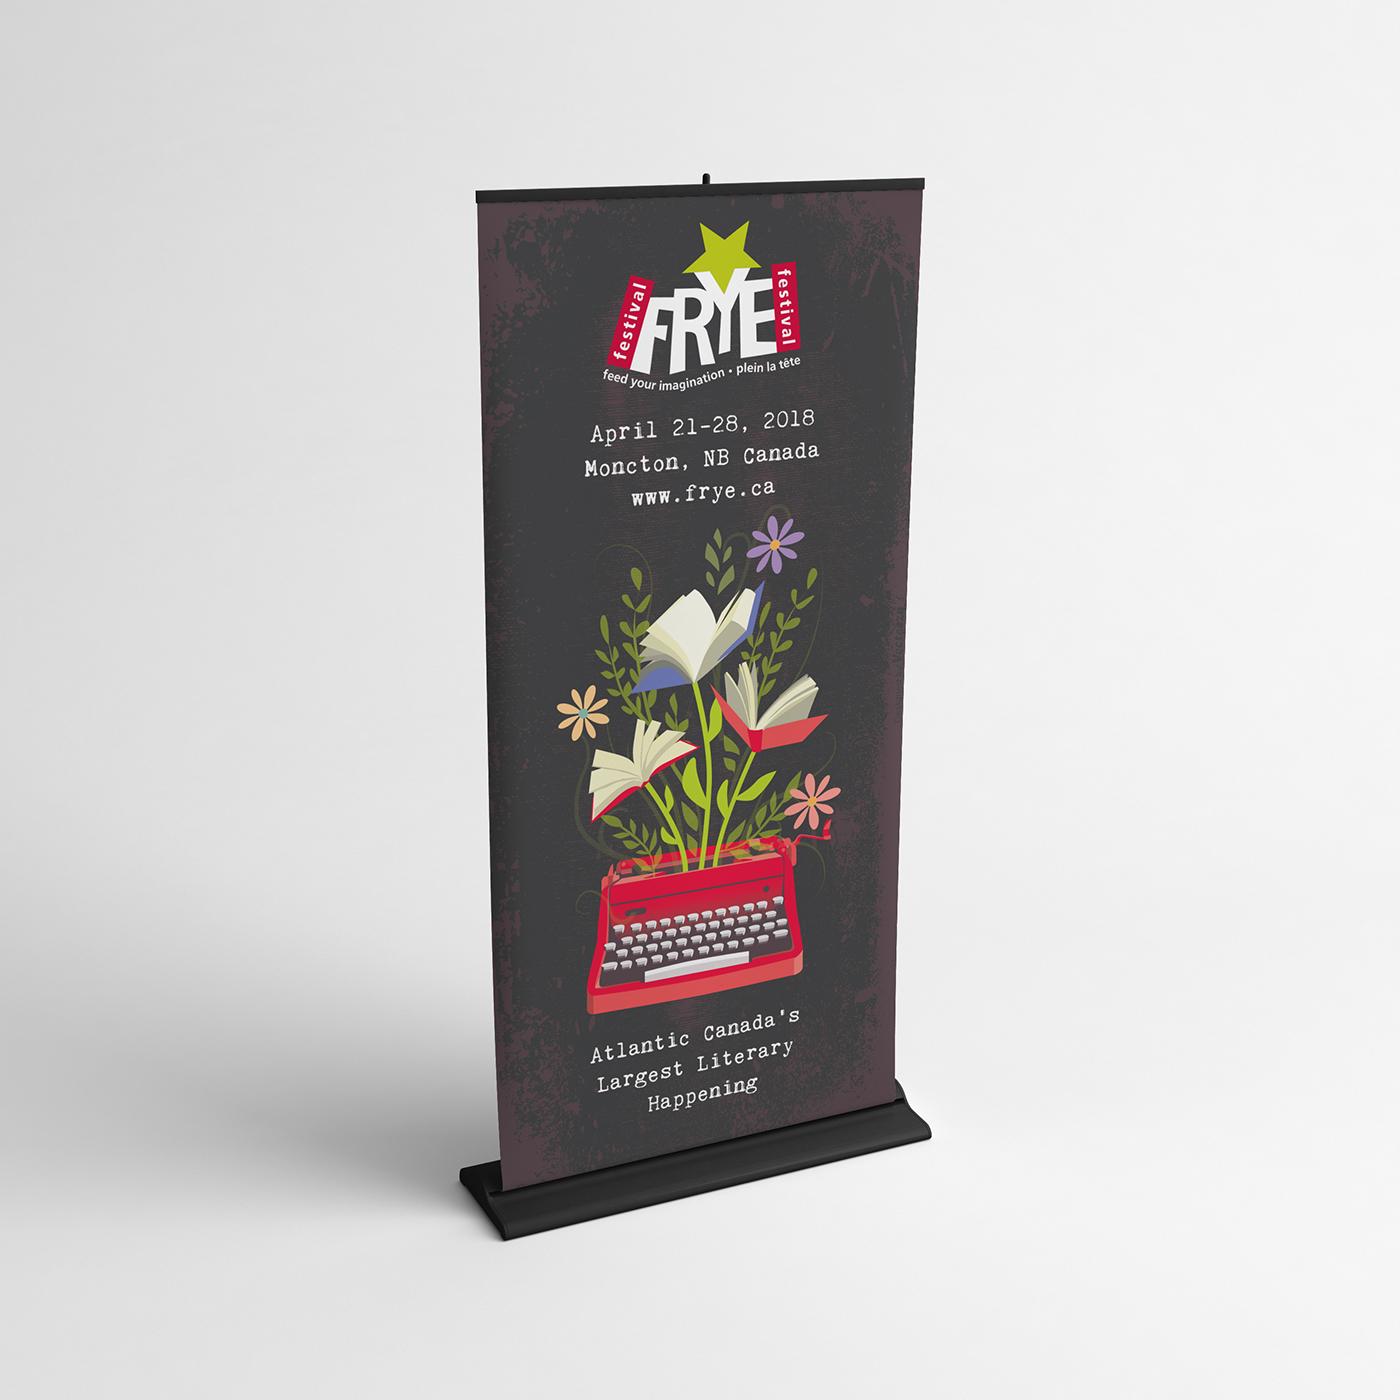 Frye Festival | Pop-up Banner & Graphics on Behance